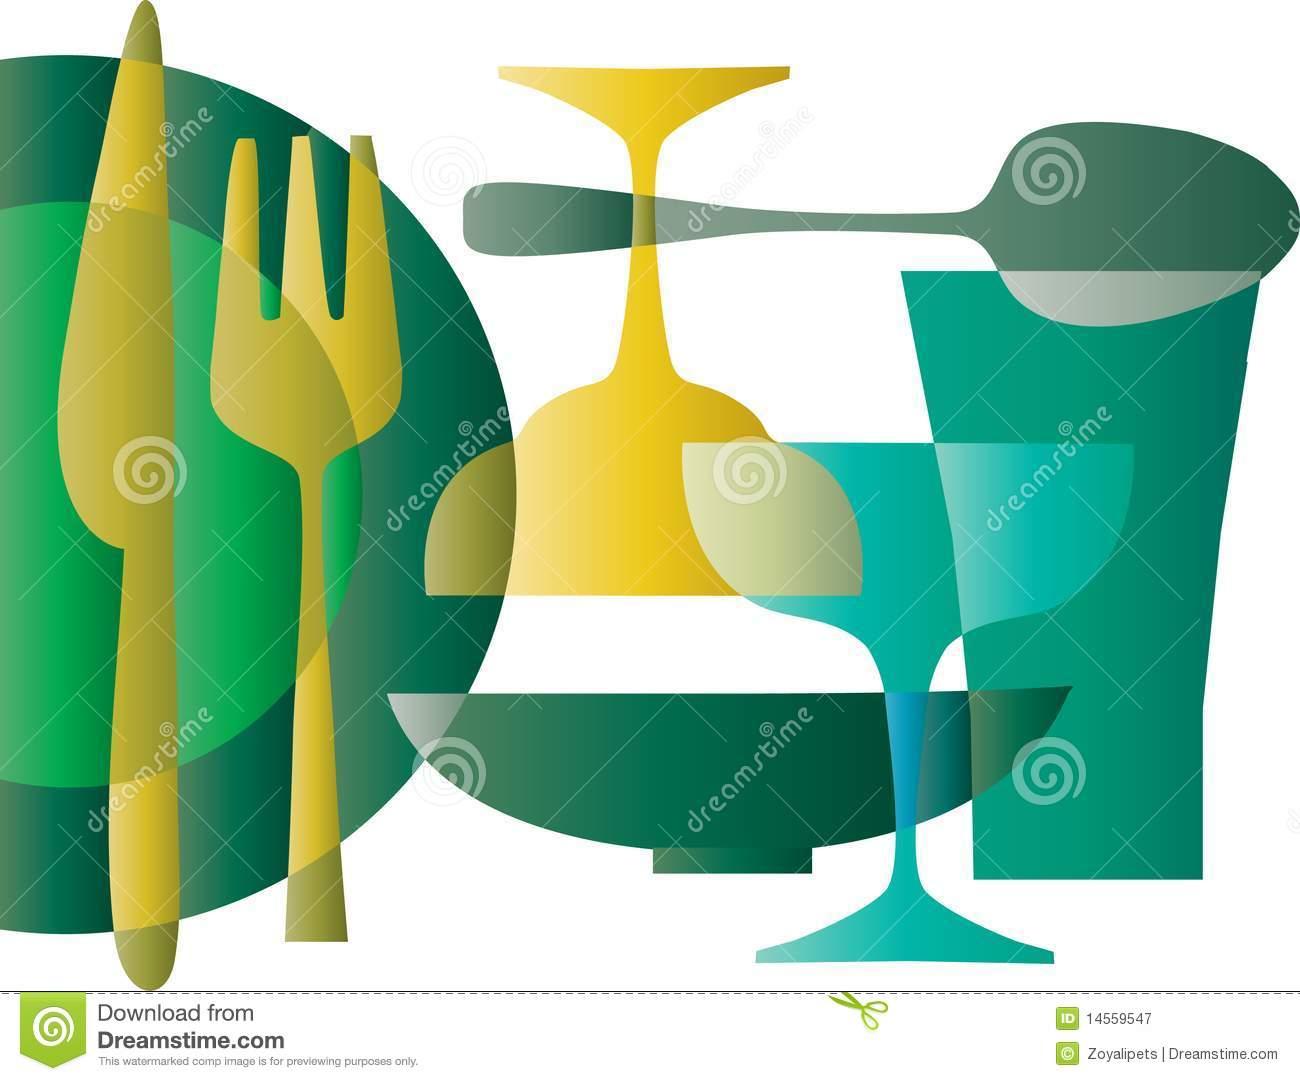 Kitchen Wallpaper Patterns 2 Designs - EnhancedHomes.org